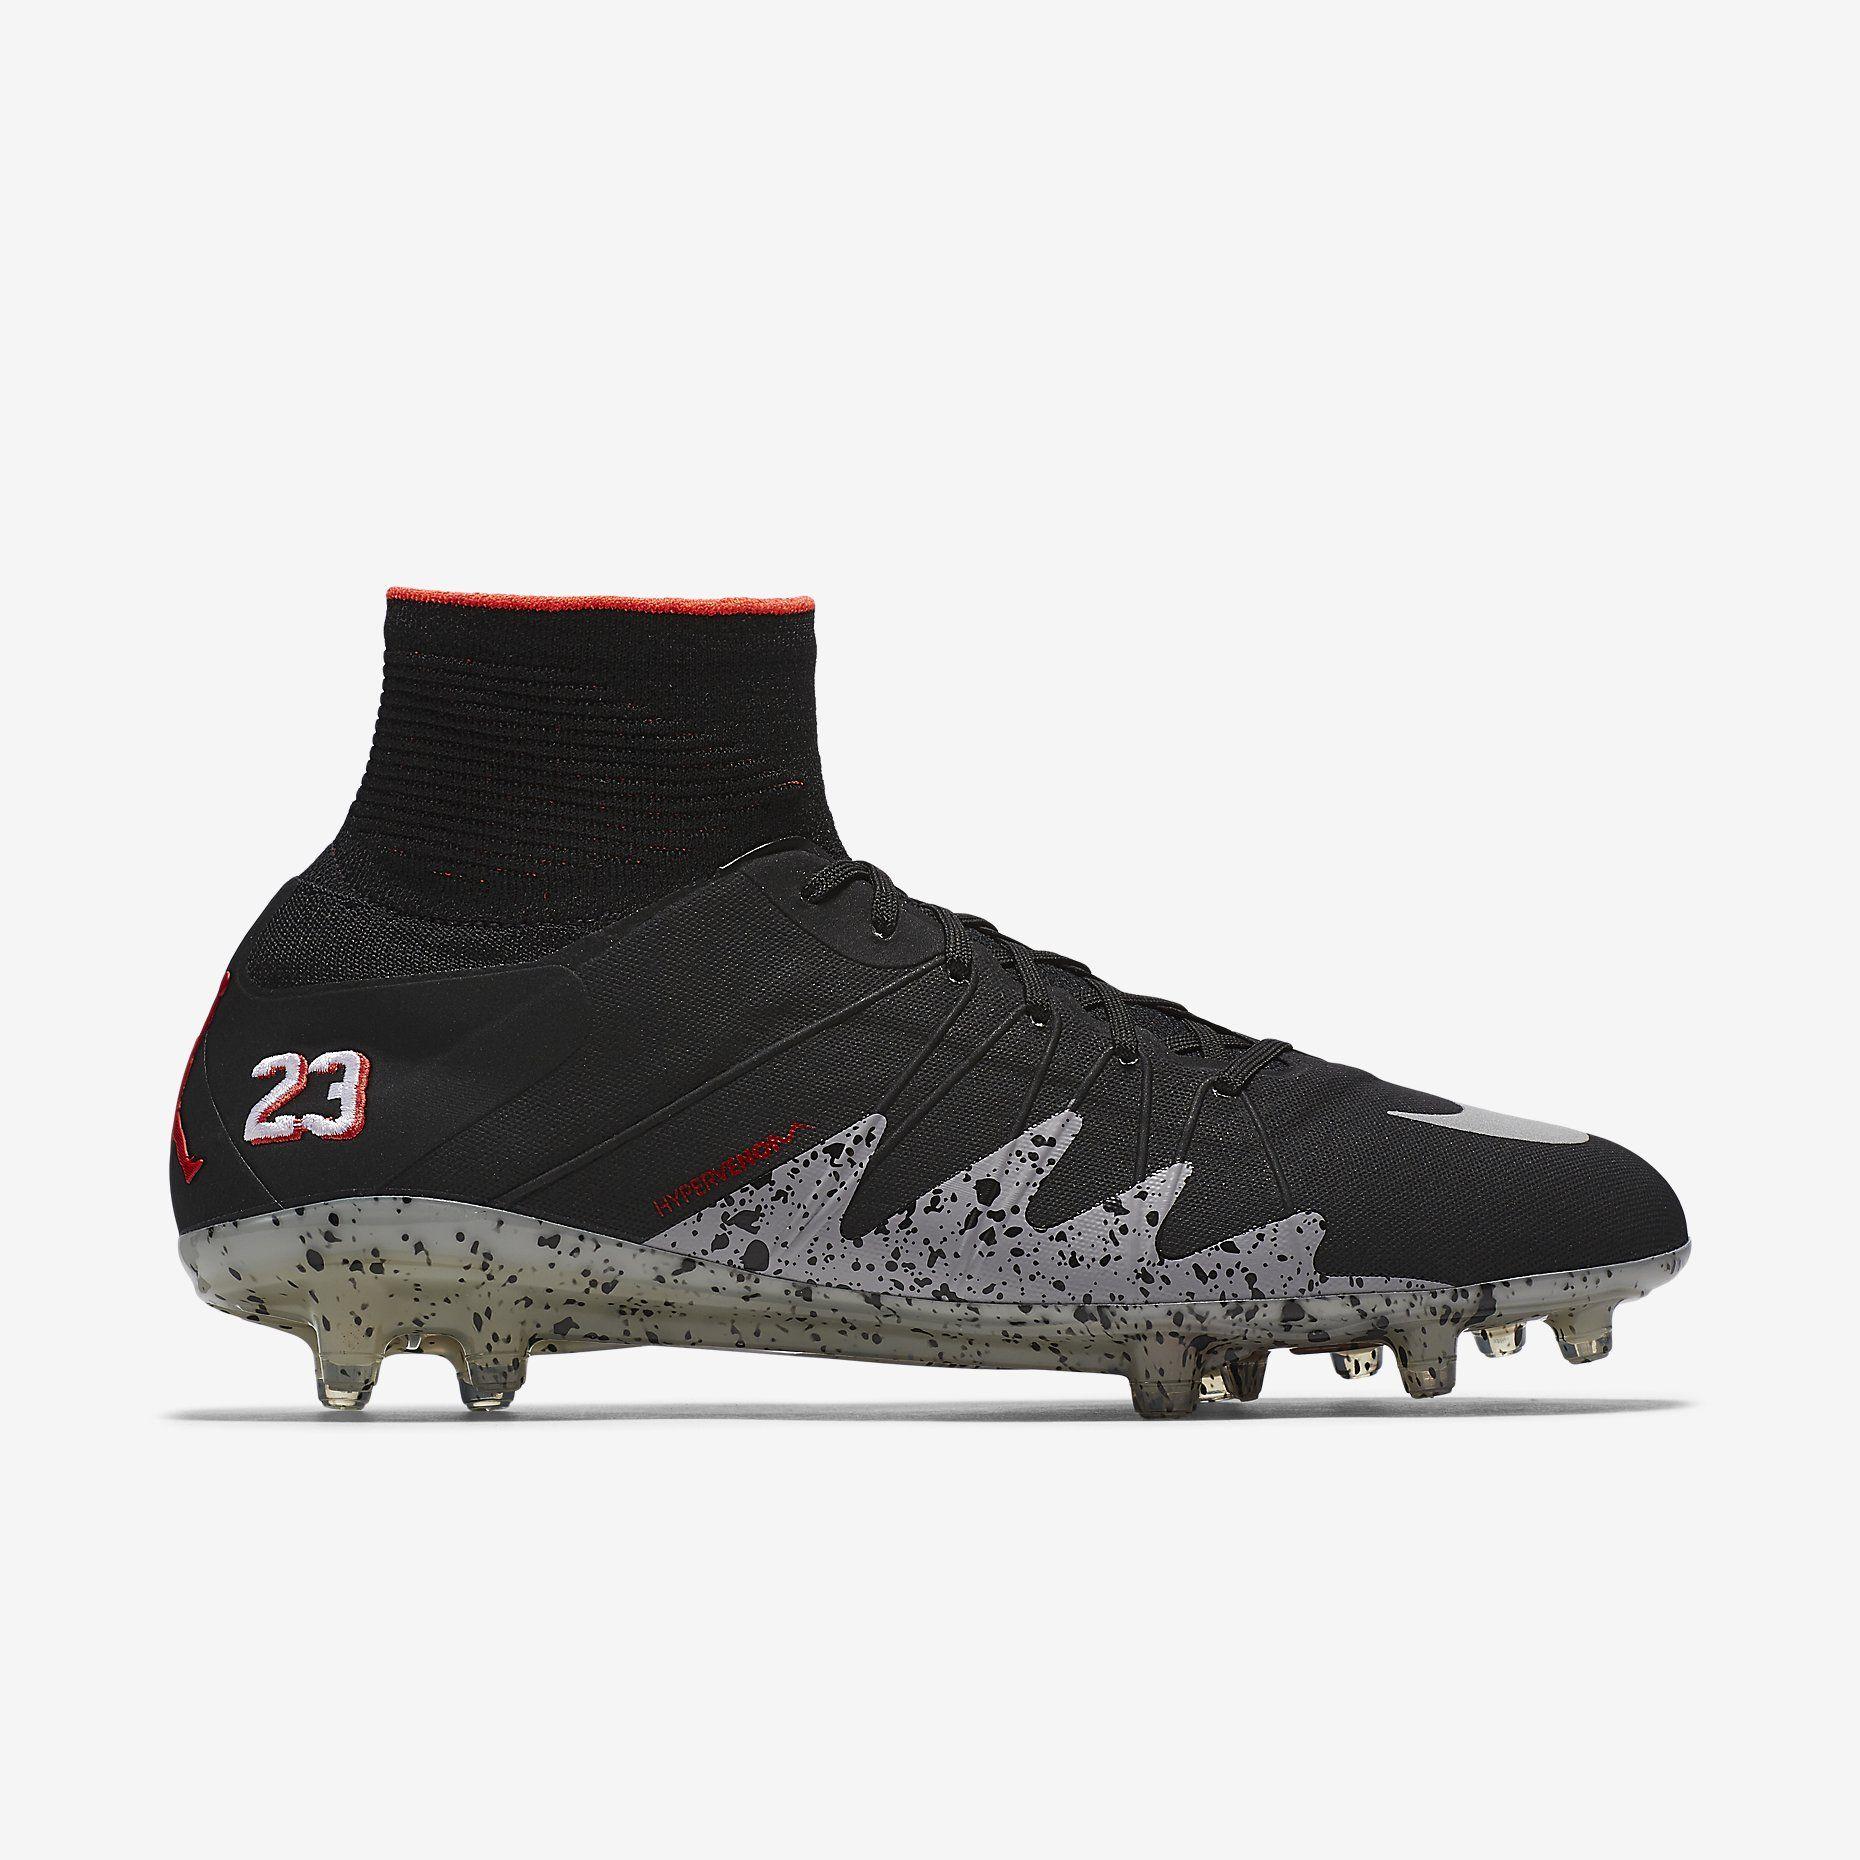 Nike hypervenom phantom ii neymar fg jordan cleats nike